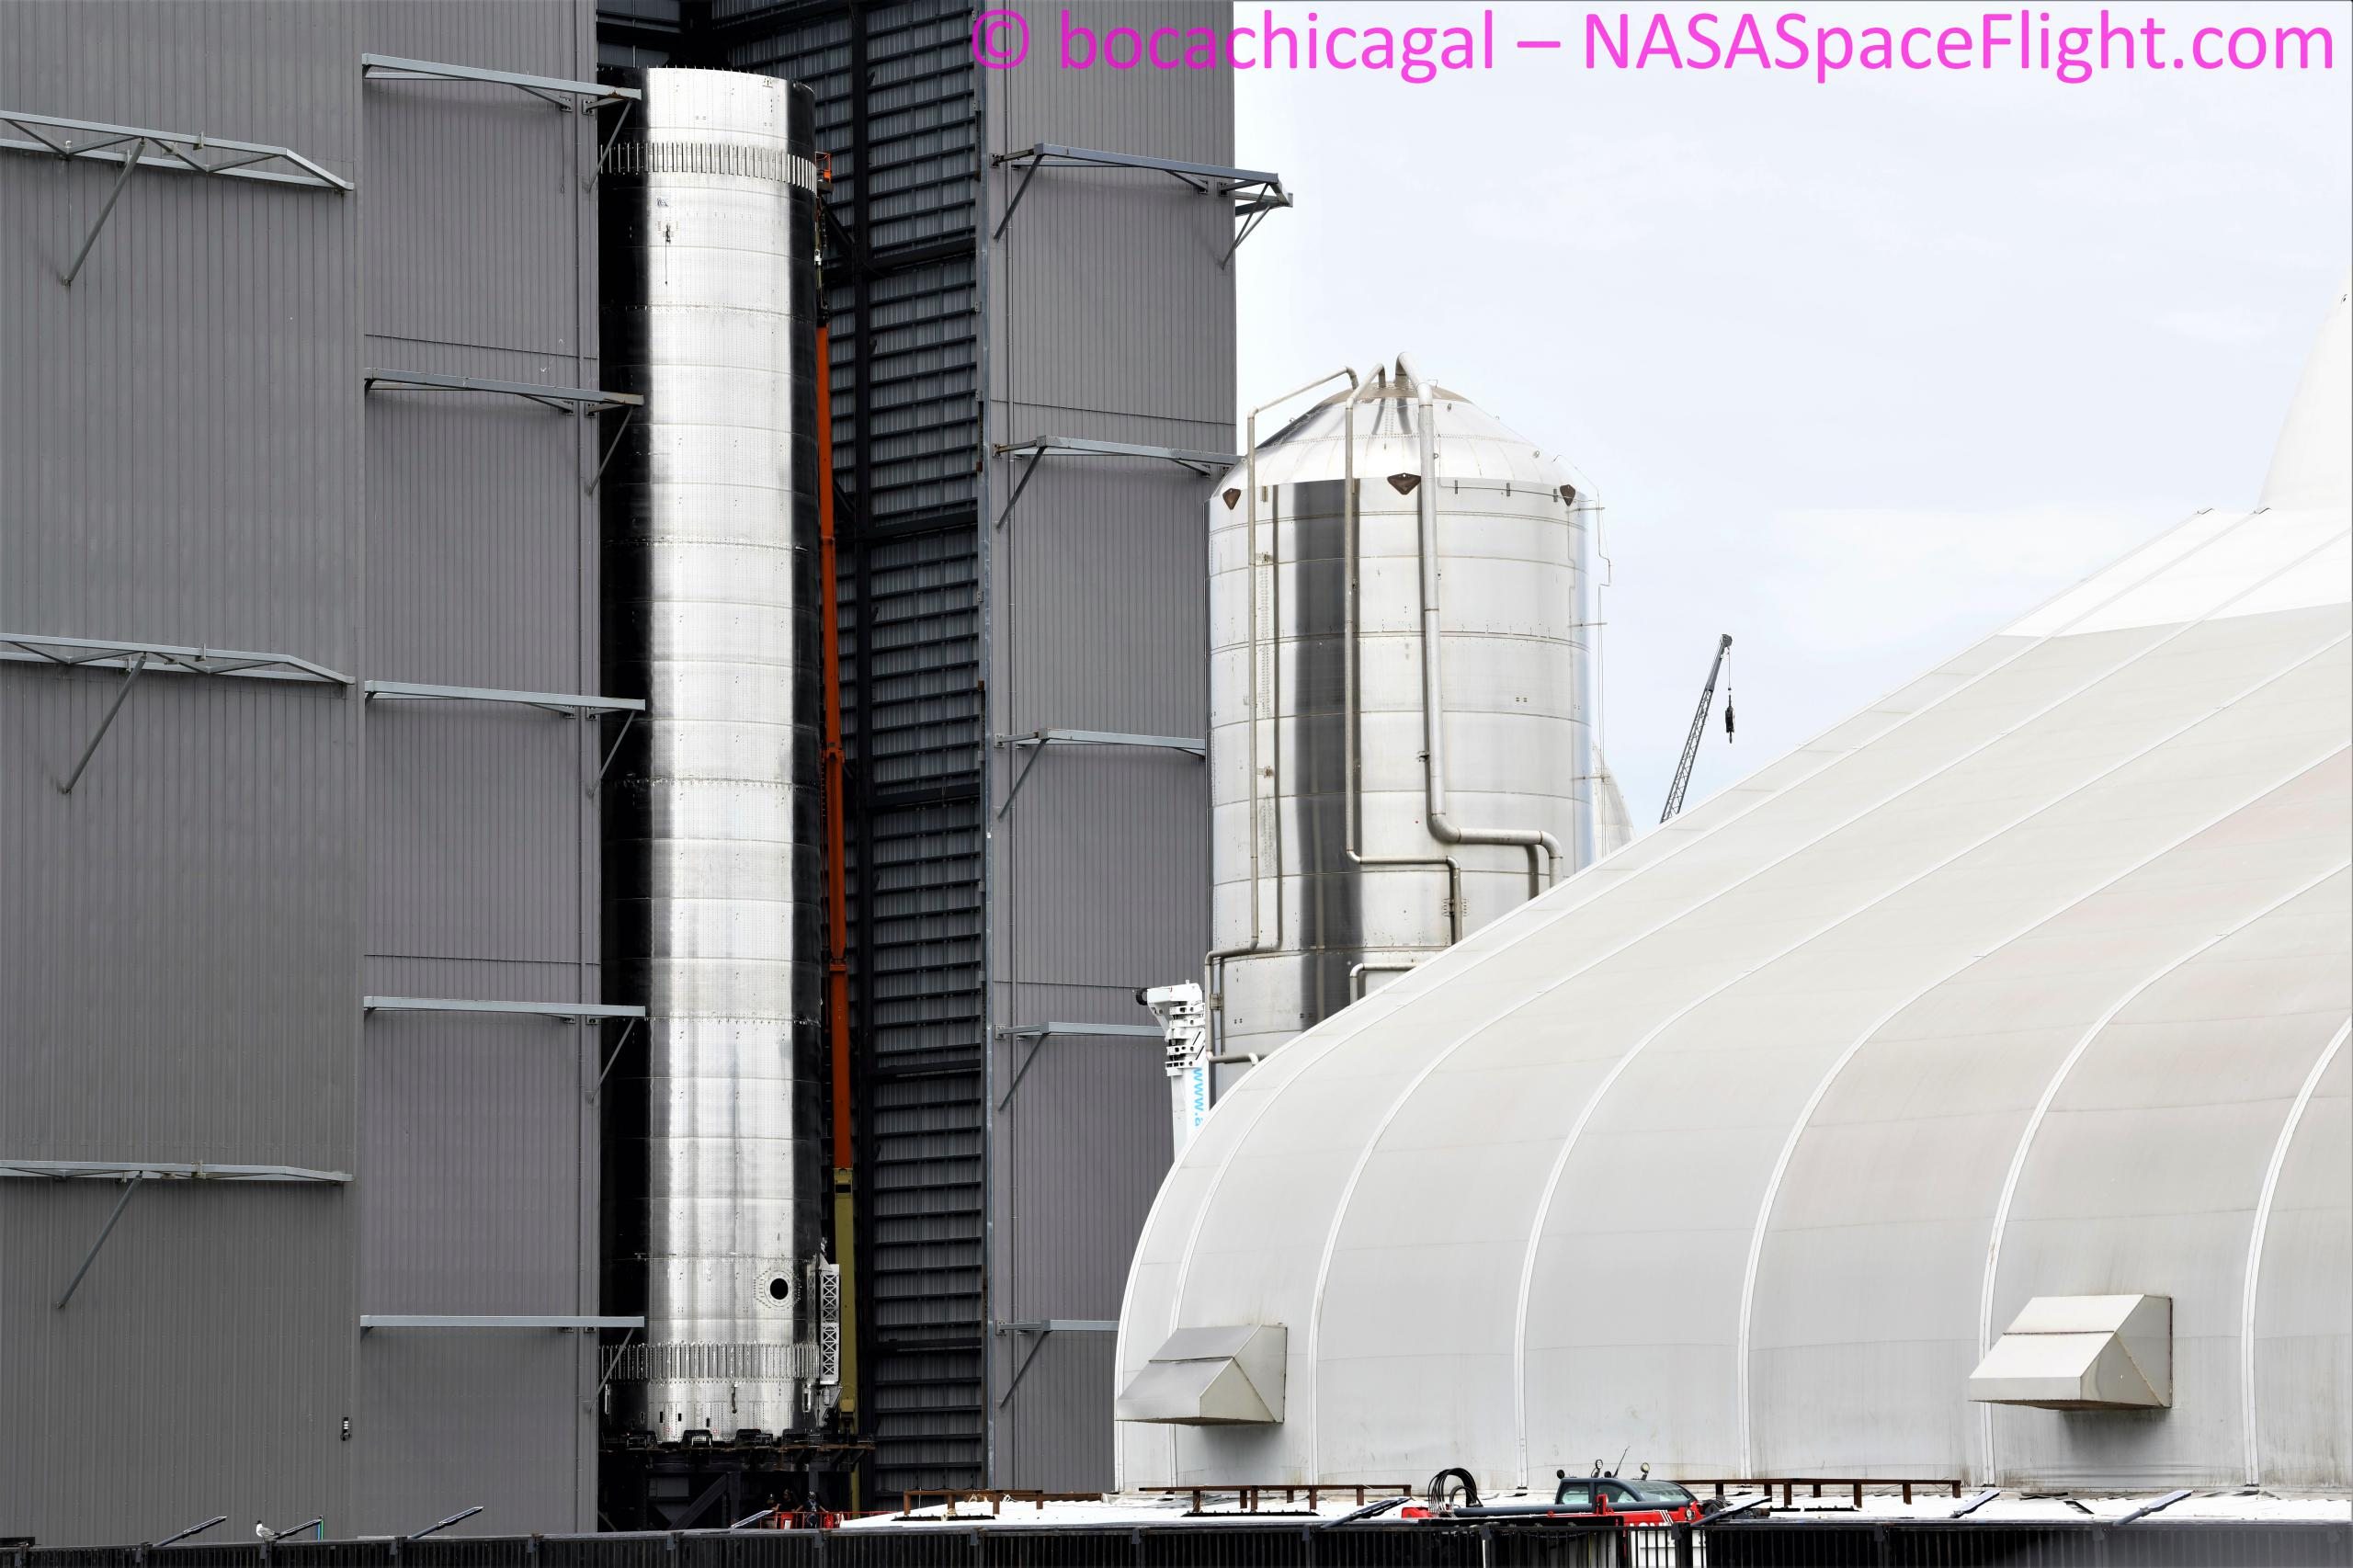 Starship Boca Chica 062921 (NASASpaceflight – bocachicagal) B3 final stack 4 (c)